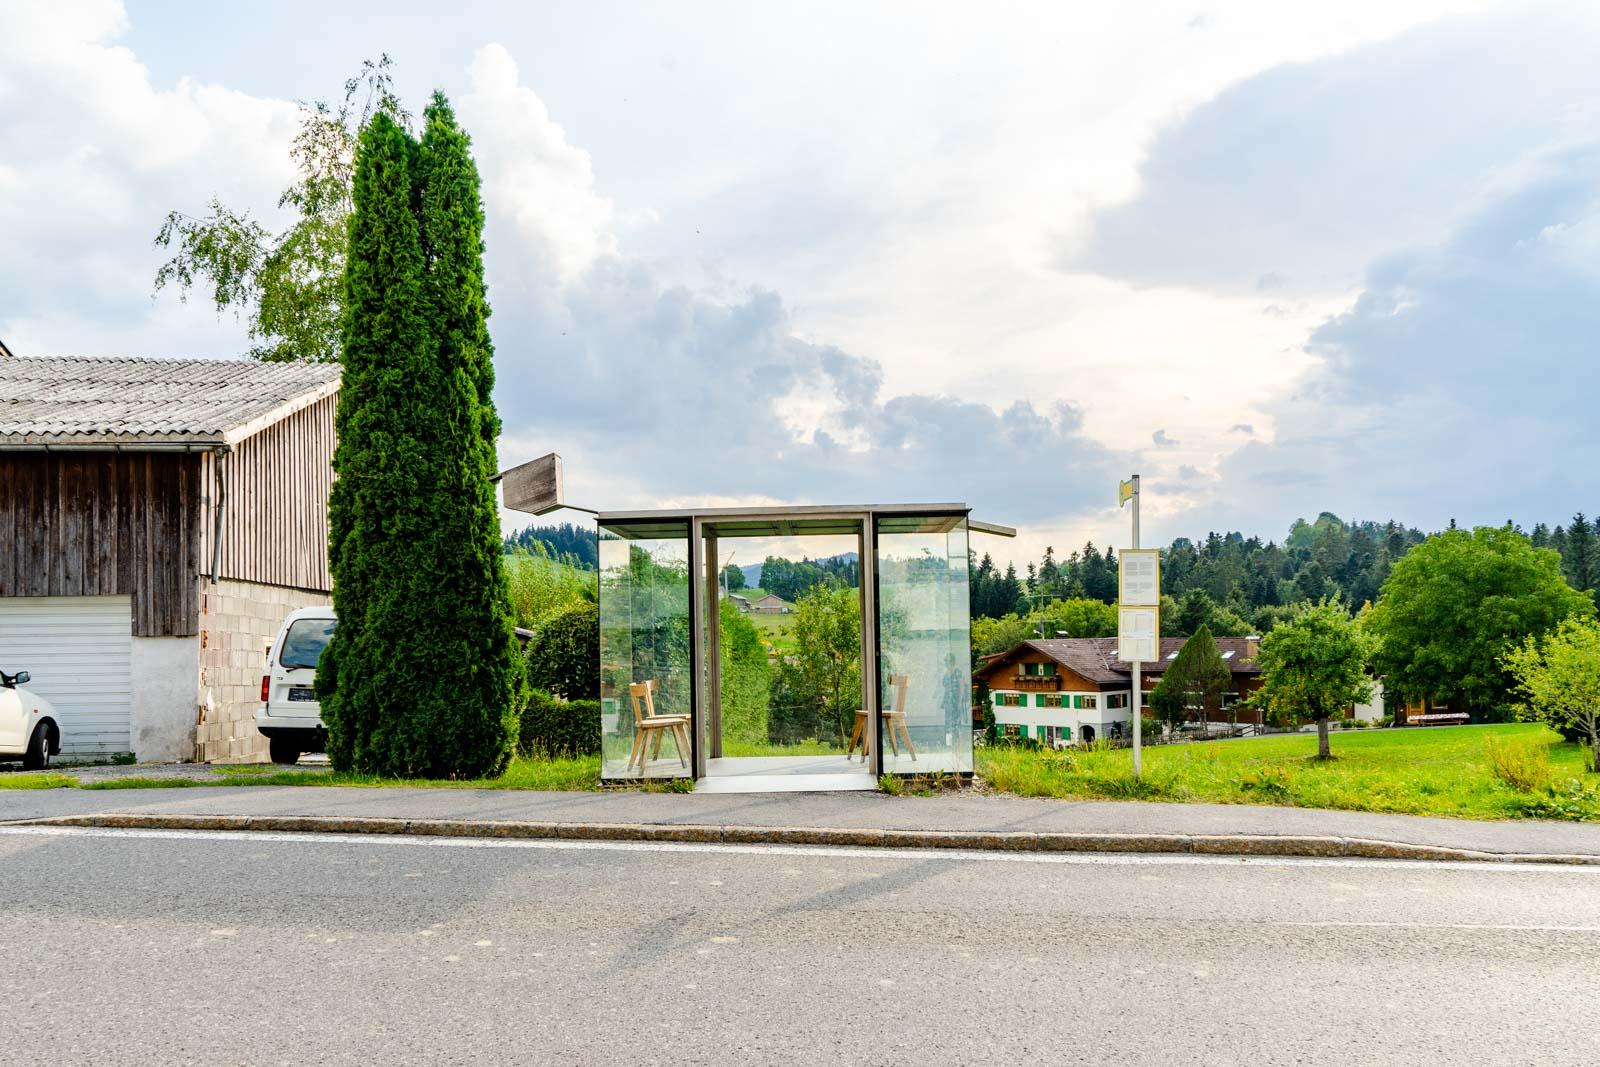 Krumbach bus stops, Vorarlberg, Austria